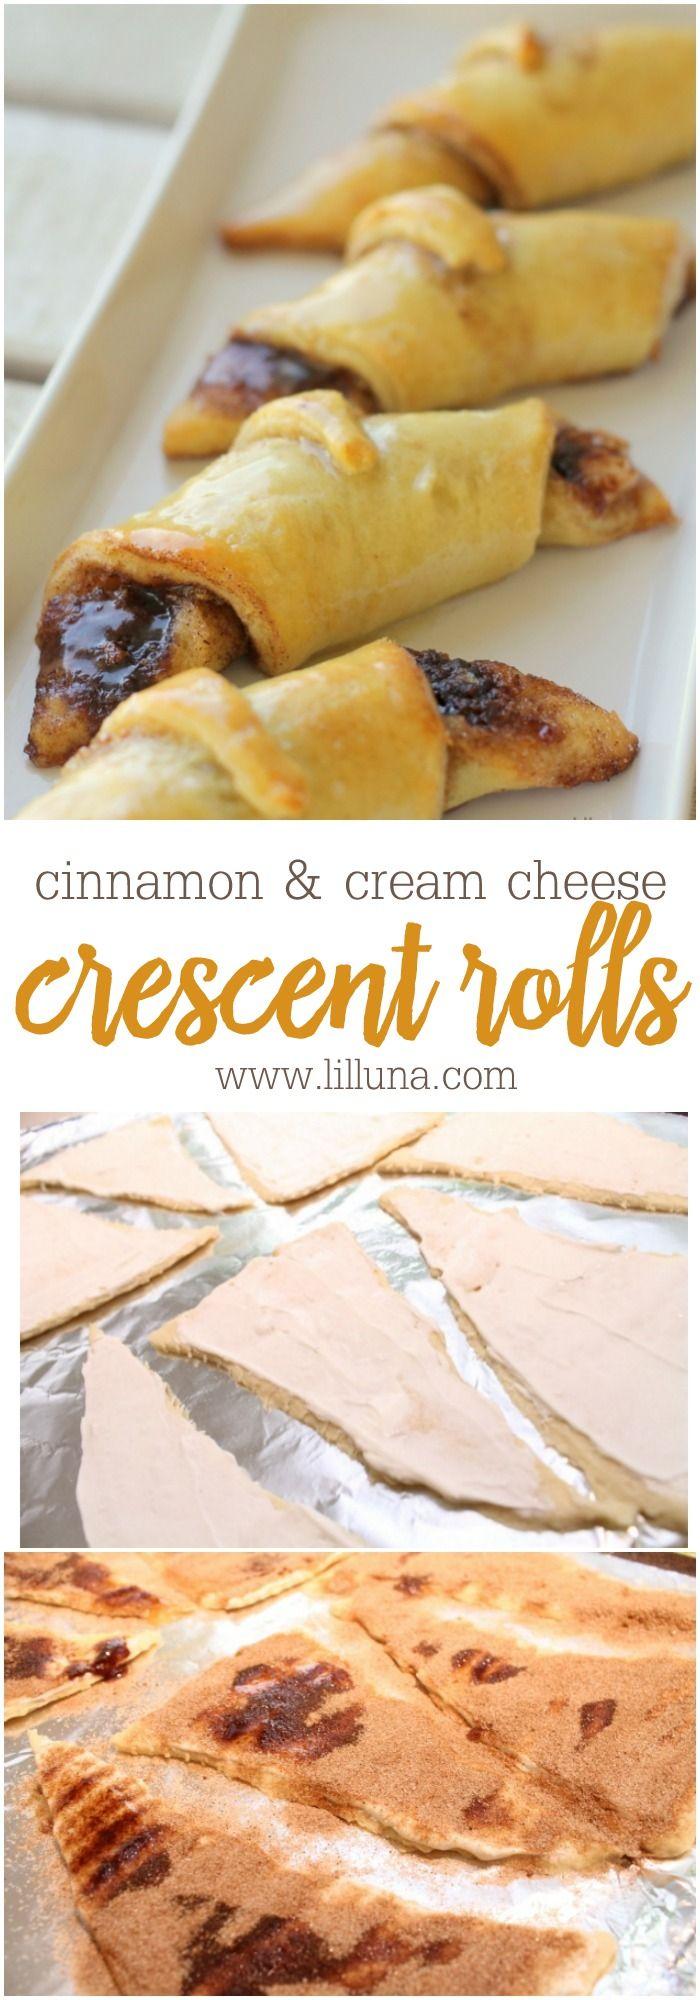 Delicious Glazed Cinnamon and Cream Cheese stuffed Crescent Rolls